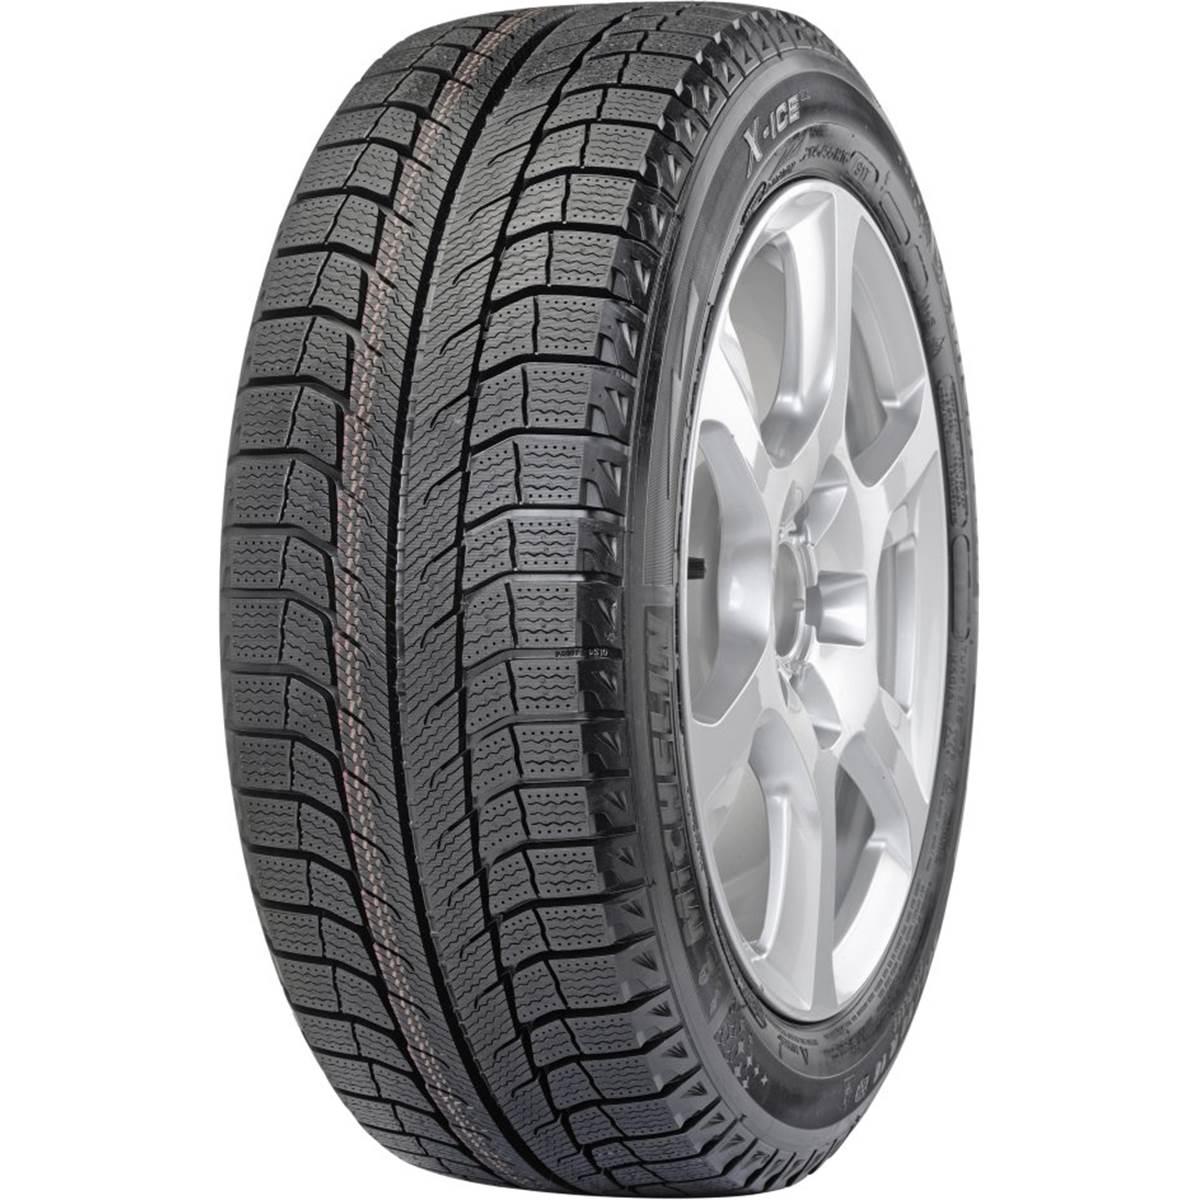 Pneu Michelin 225/65R17 102T